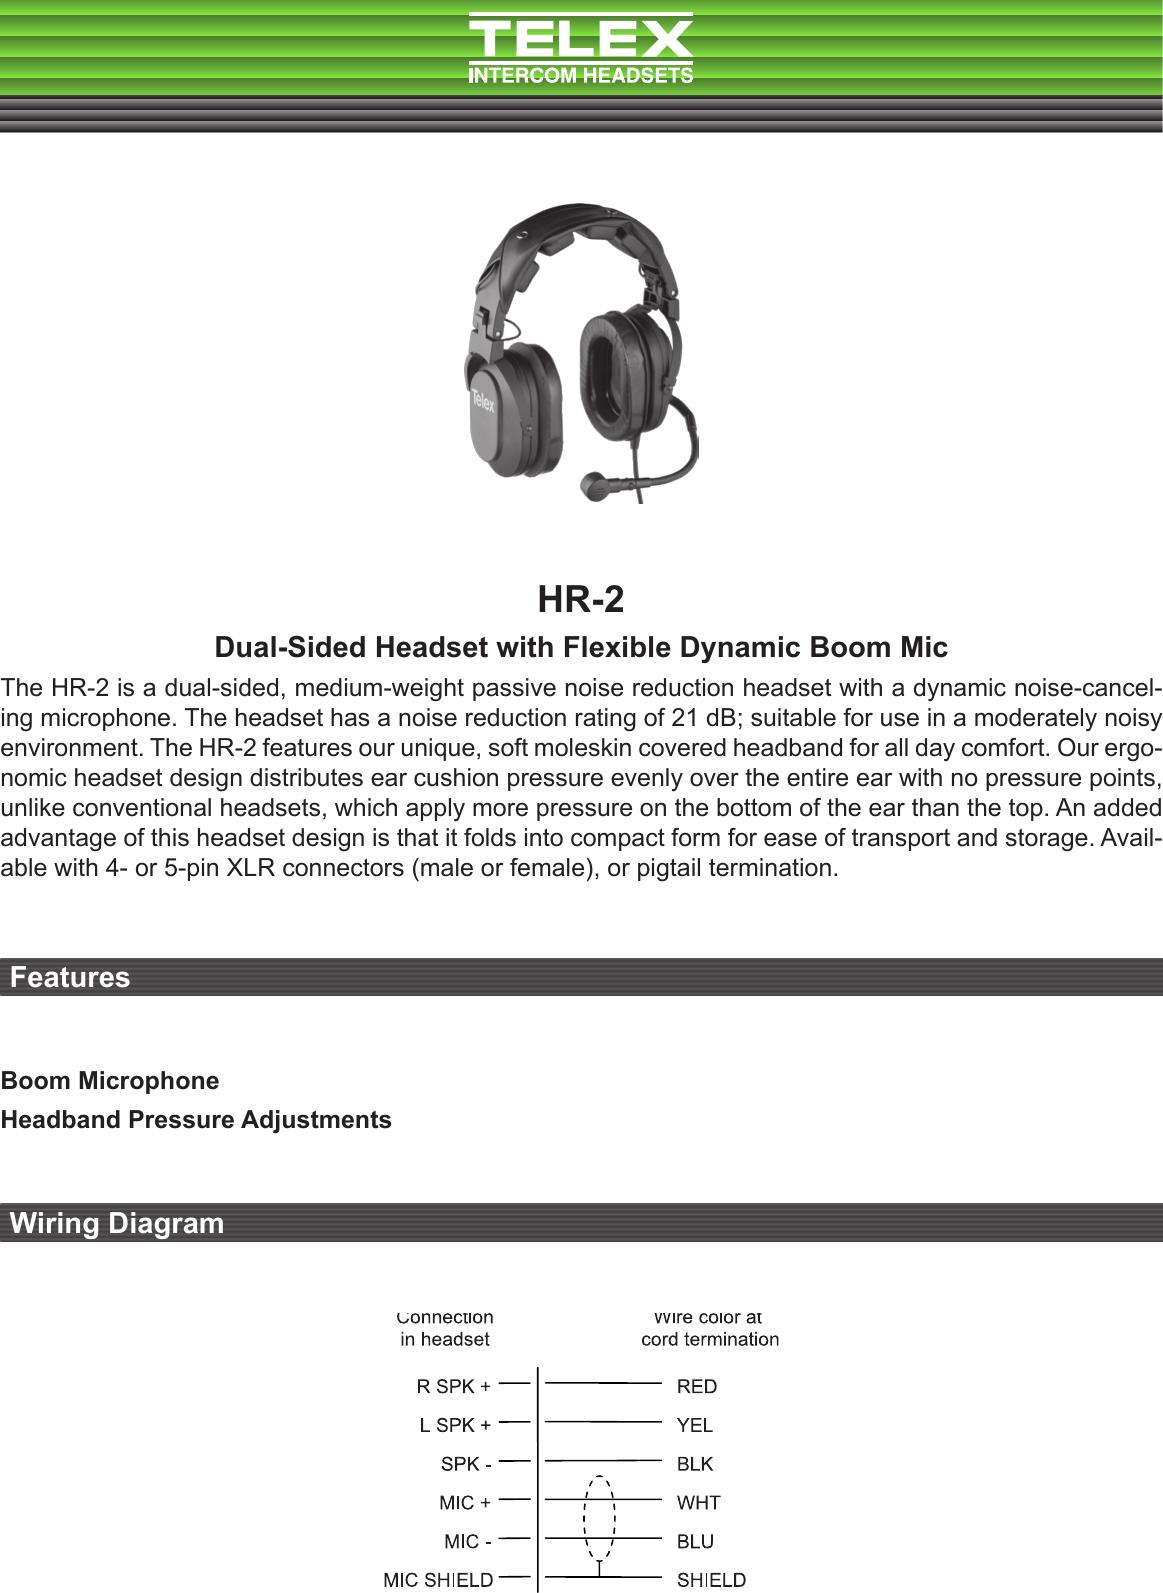 Telex Hr 2 Users Manual Technical Data Sheet Intercom Wiring Diagram